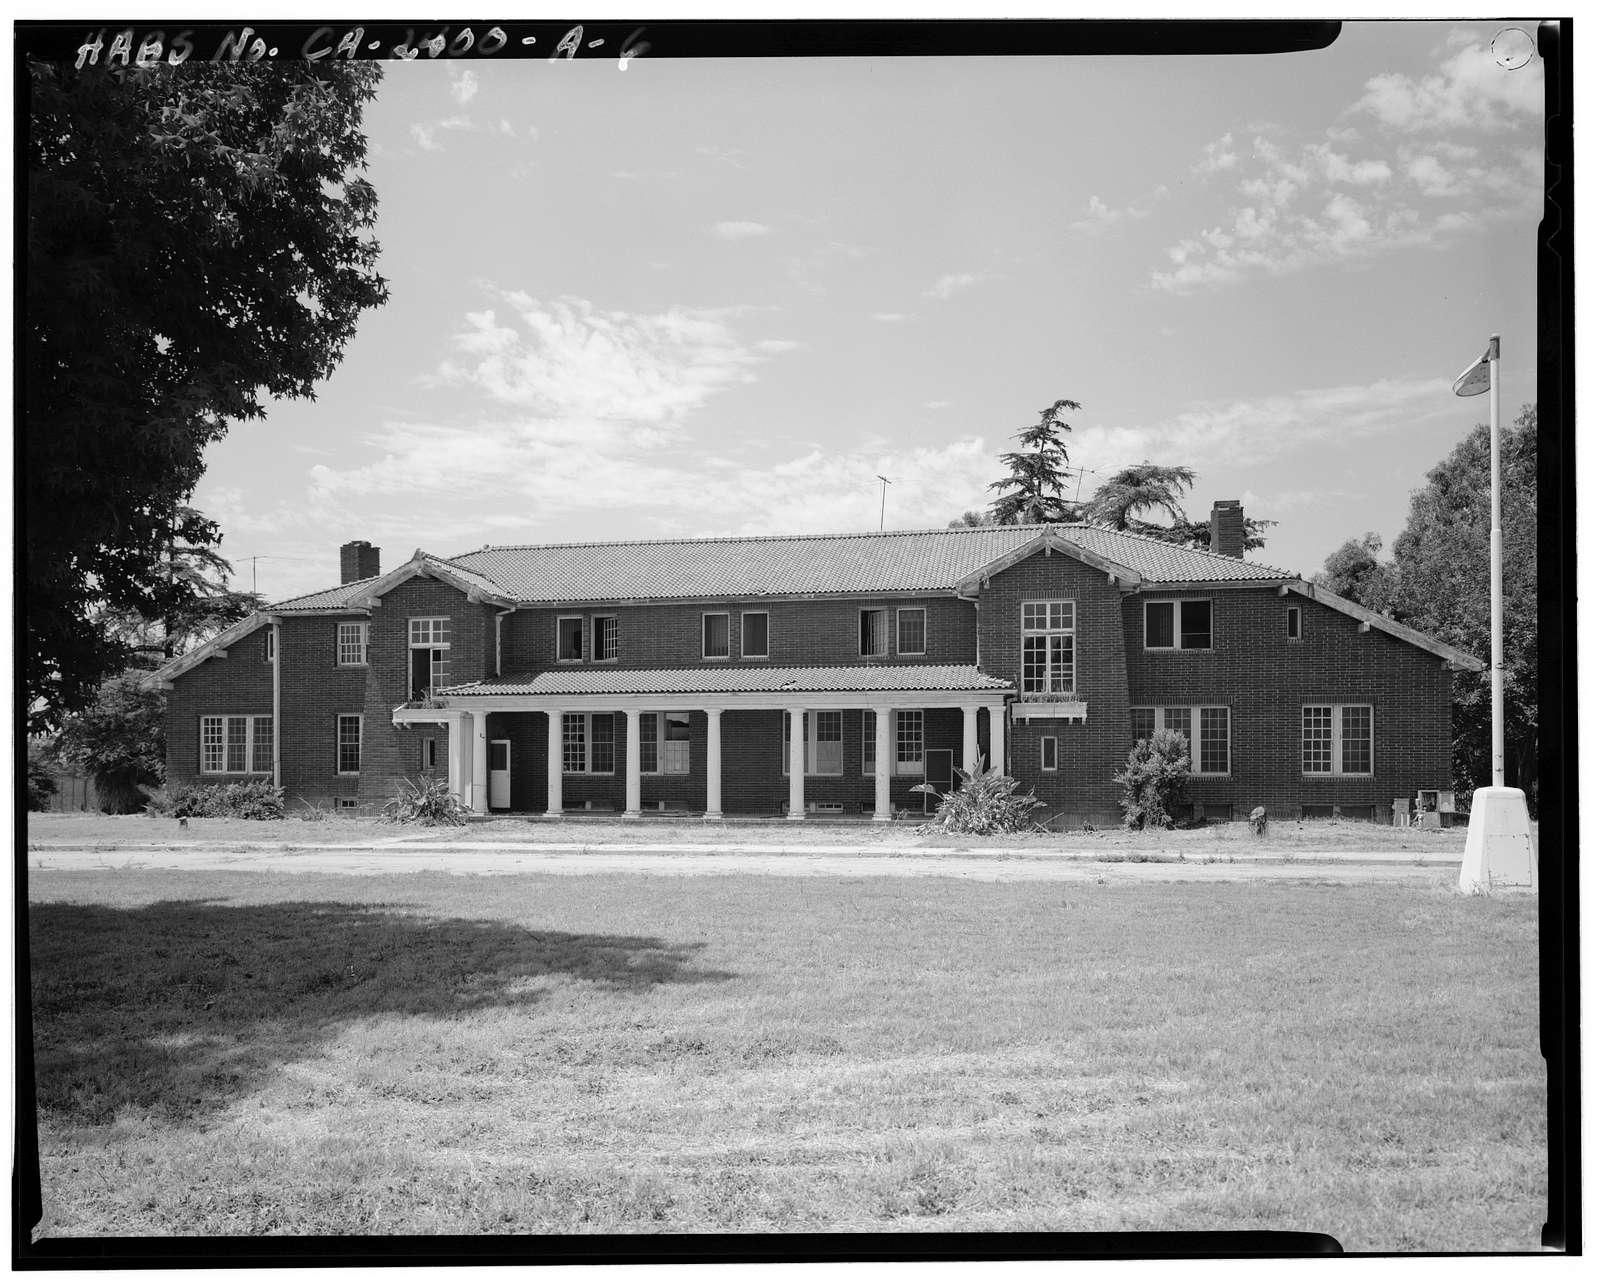 Whittier State School, Hospital & Receiving Building, 11850 East Whittier Boulevard, Whittier, Los Angeles County, CA